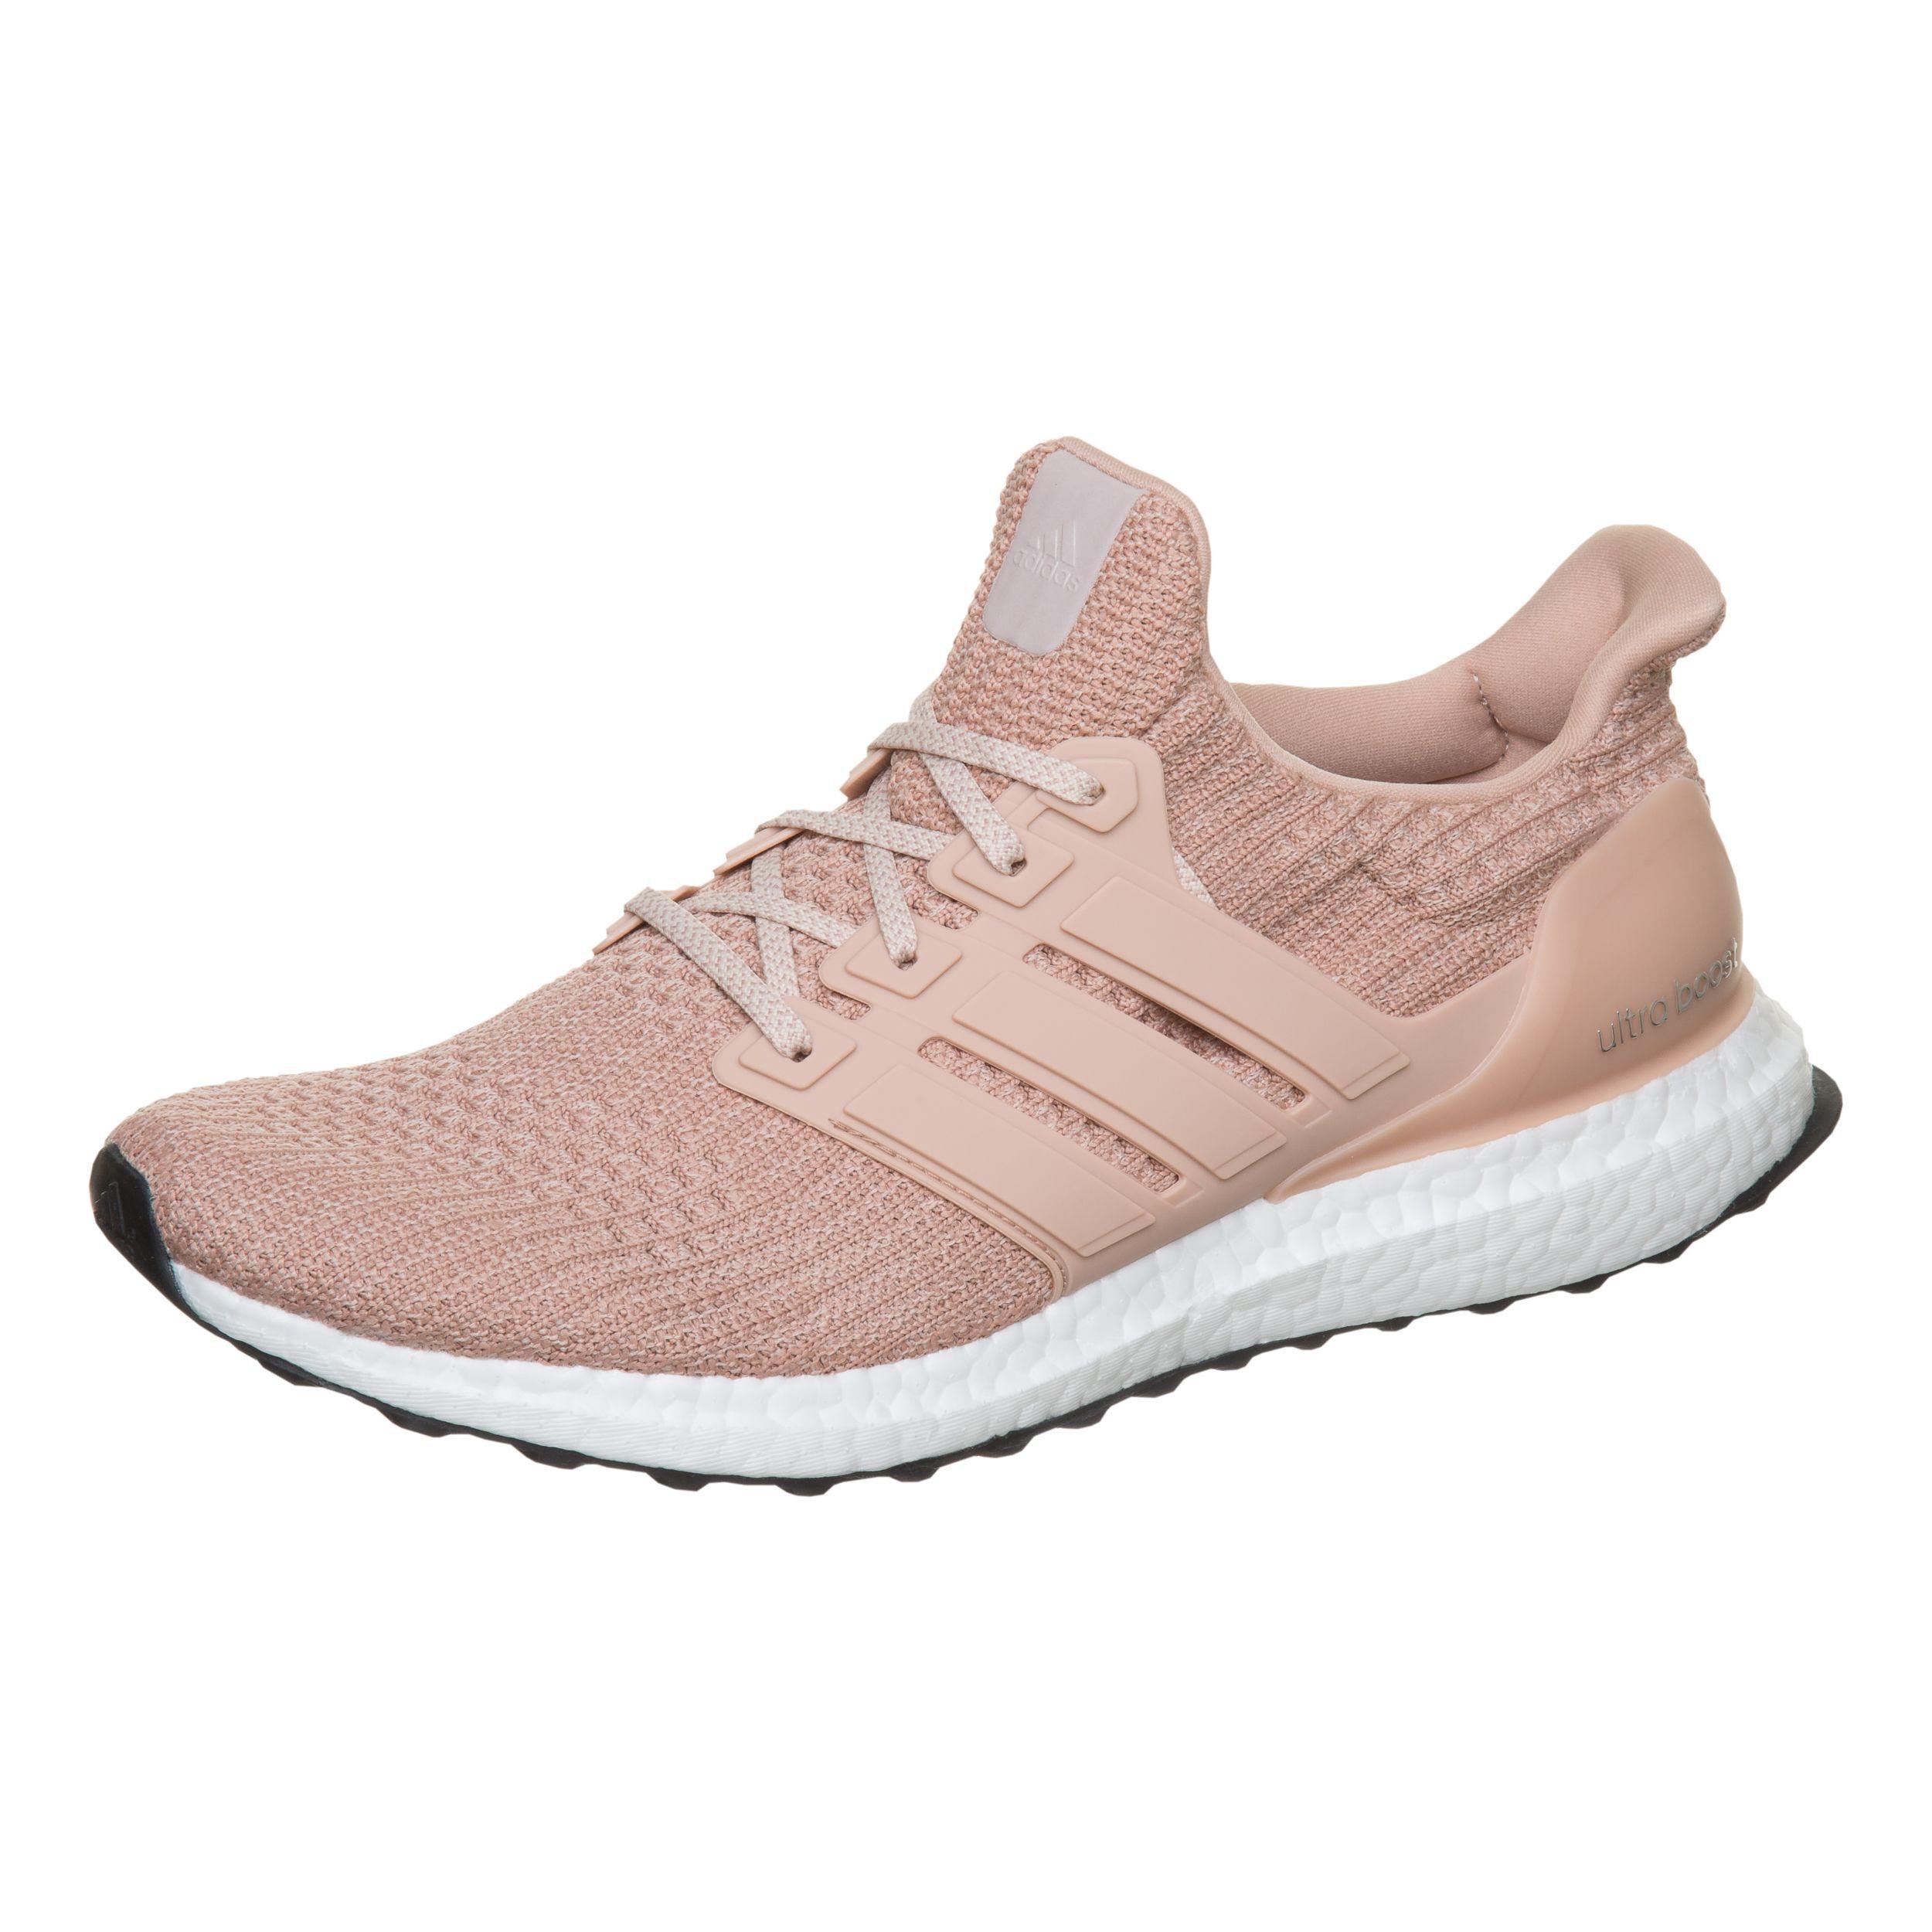 adidas Ultra Boost Neutralschuh Damen - Rosa, Weiß